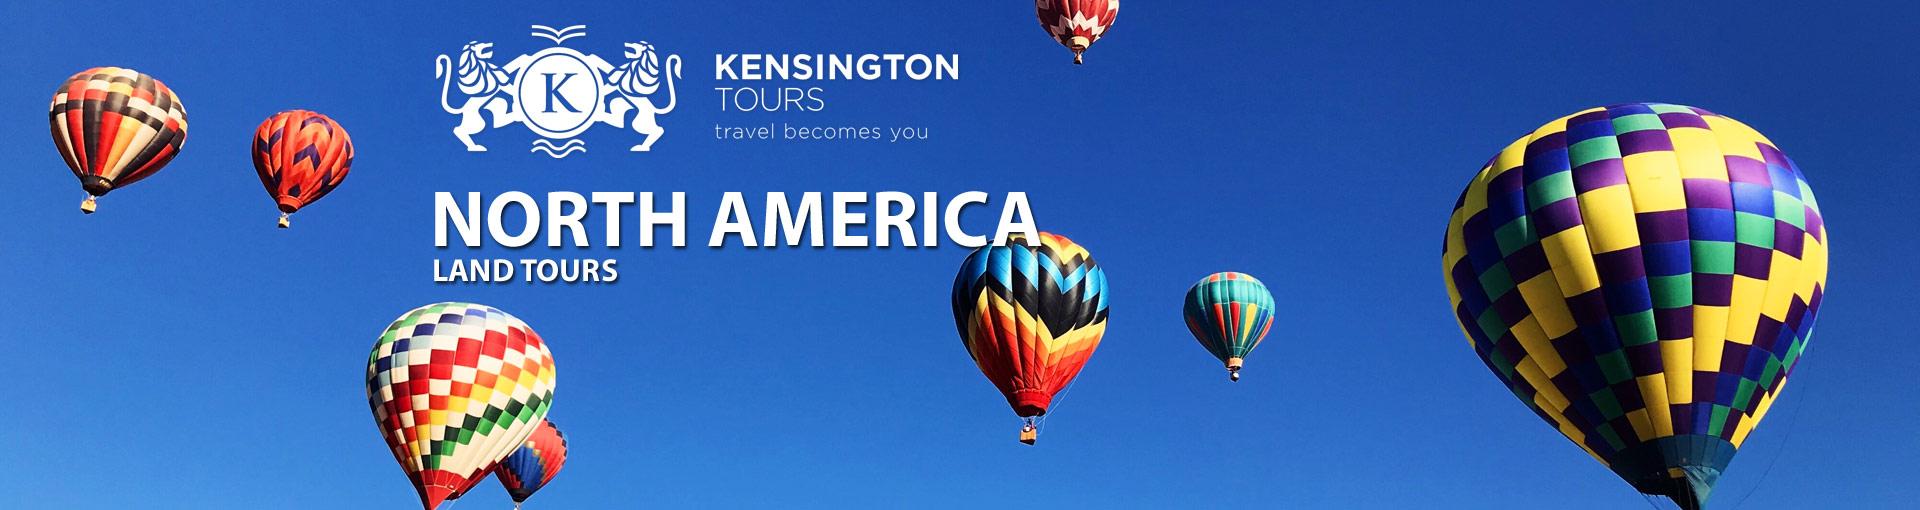 Kensington Tours - North America Land Tours